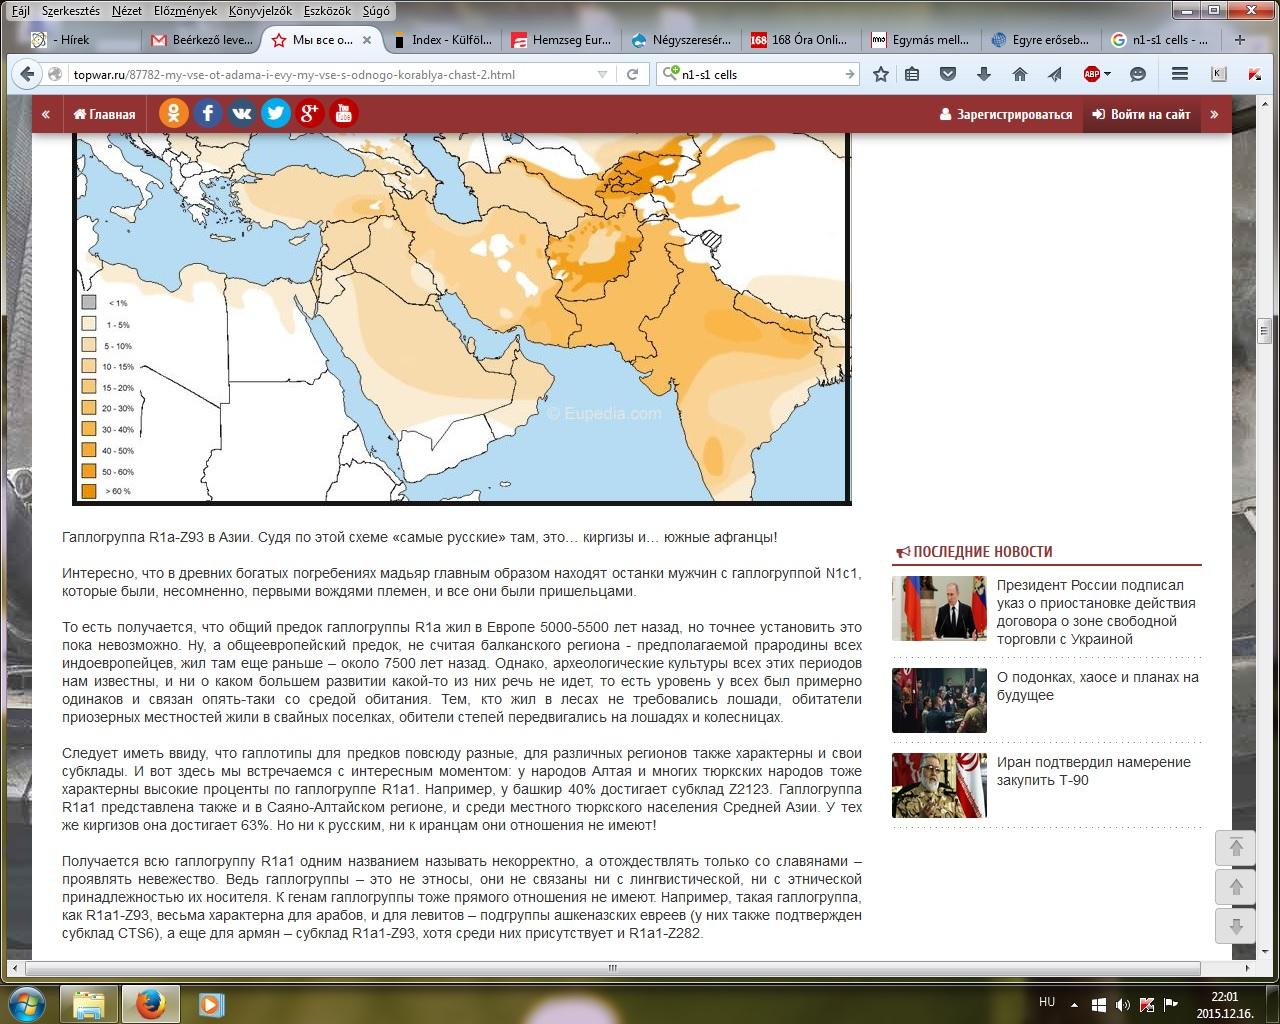 postaimre.magyarnemzetikormany.com/images/news/magyarokvezetoifoldonkivuliek.jpg